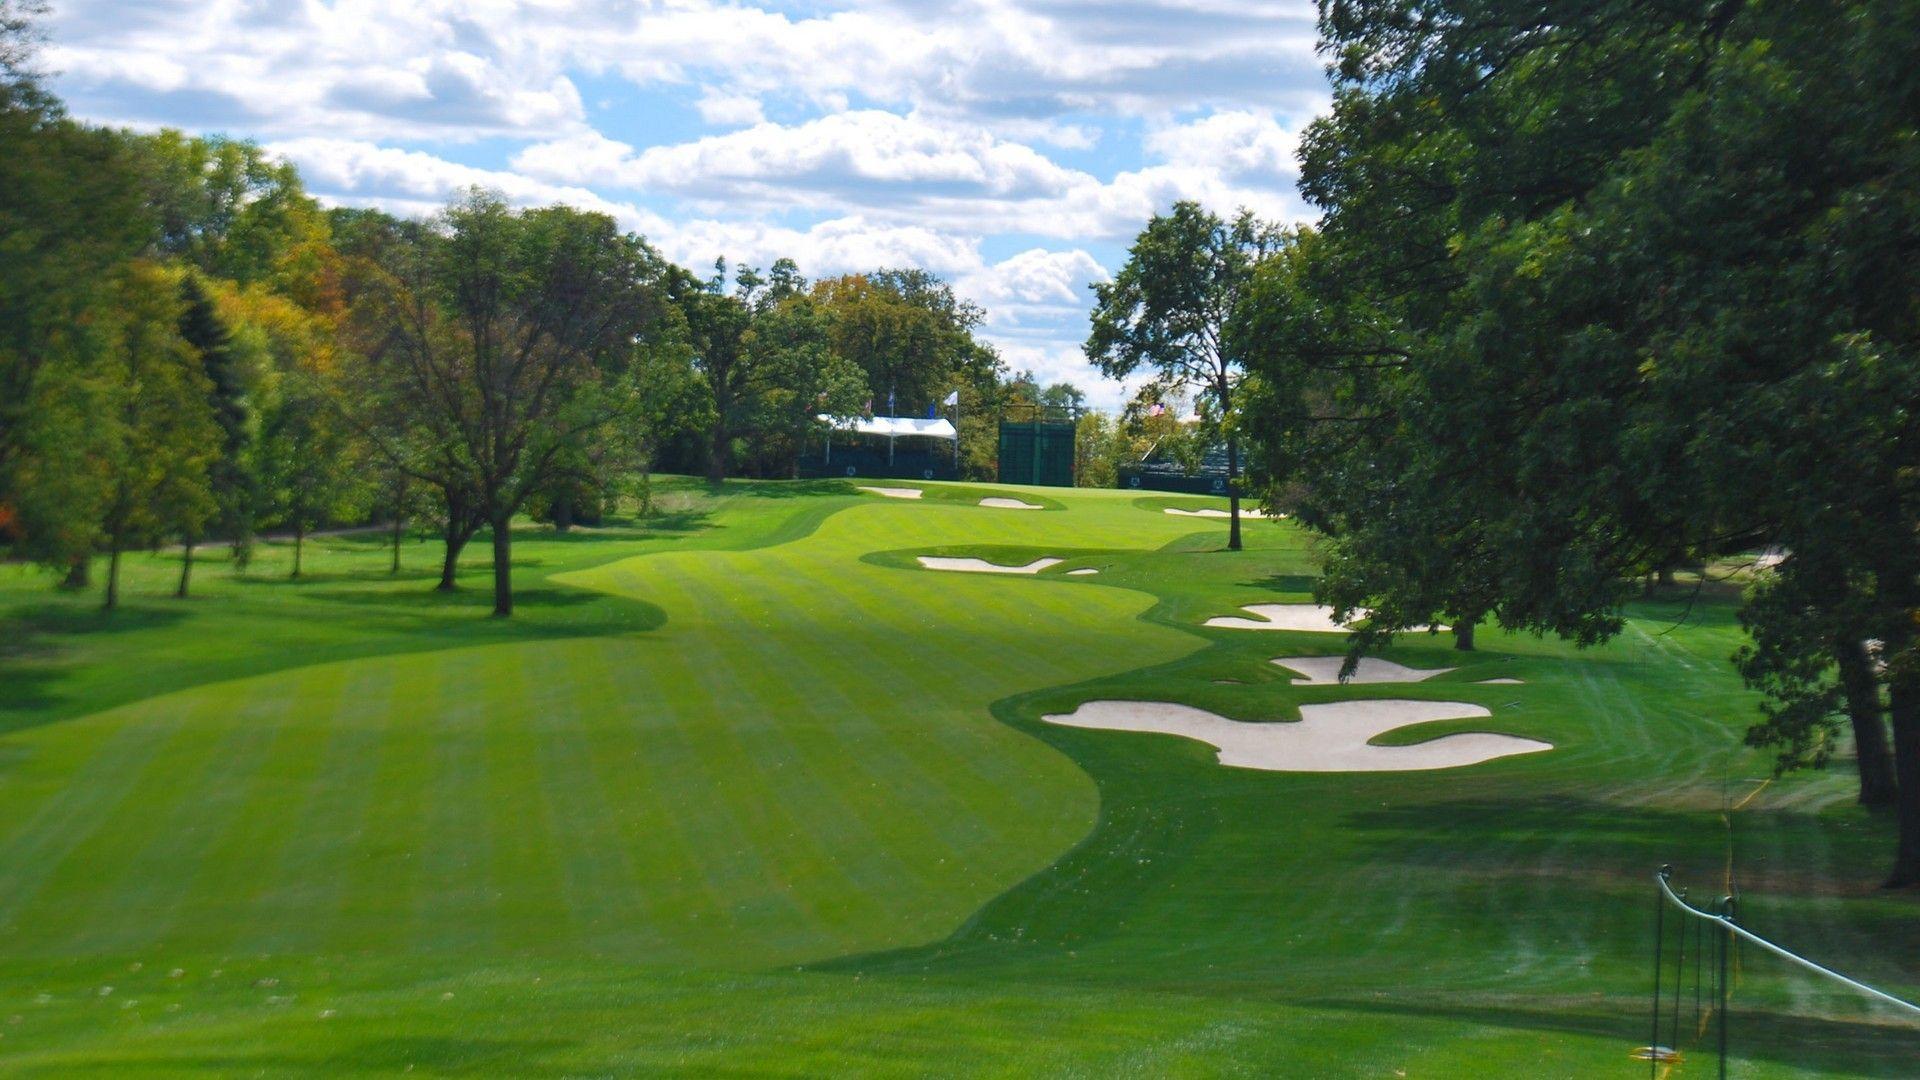 golf image free